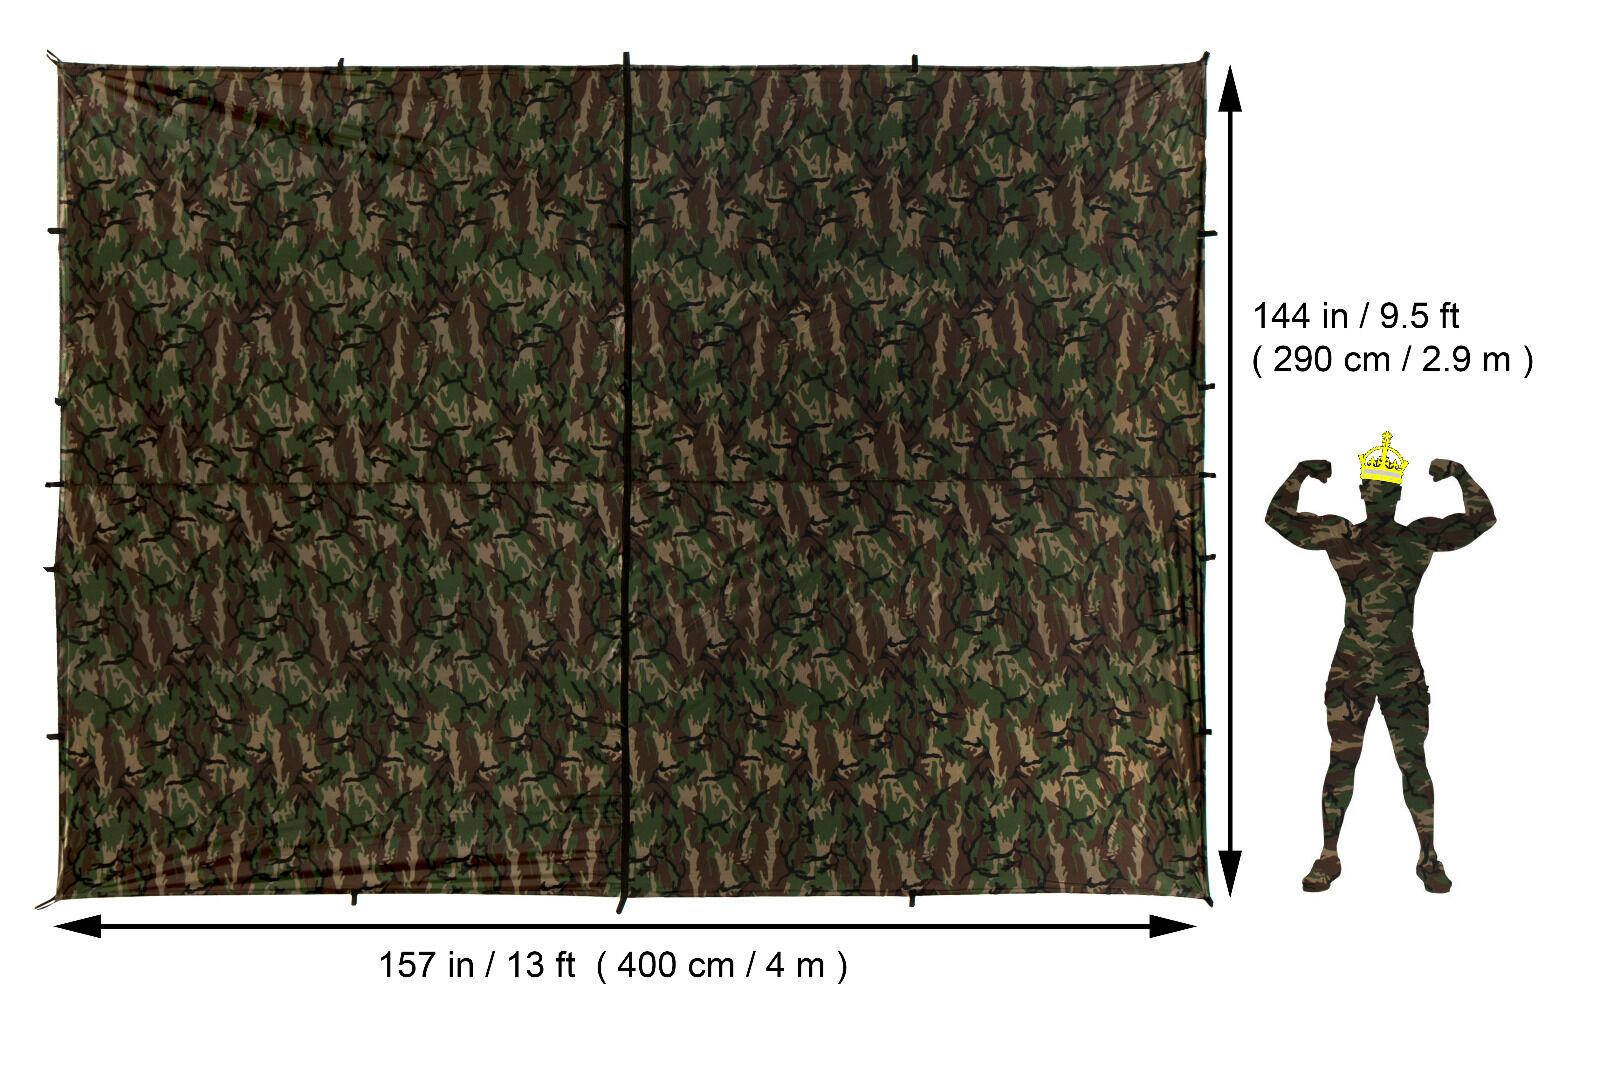 Aqua Quest Defender re Kamo TELONE Basha  100% Impermeabile 4 x 3 M CAMOUFLAGE